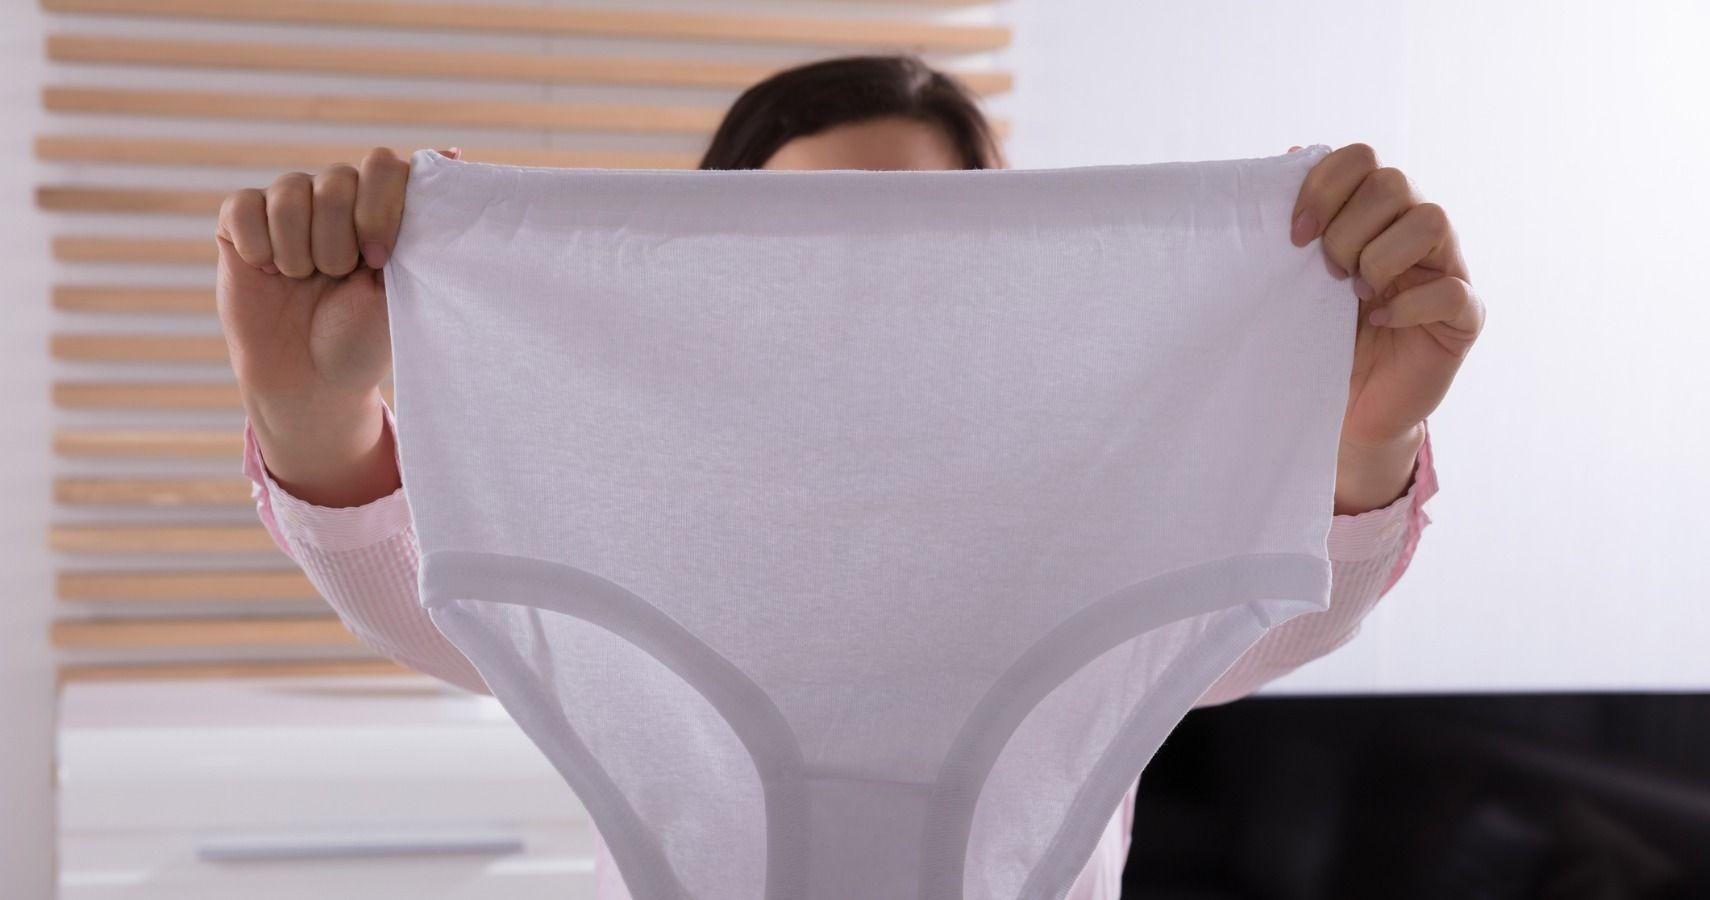 e22b3fda2678 Granny Panties Are Making A Fashion Comeback | Moms